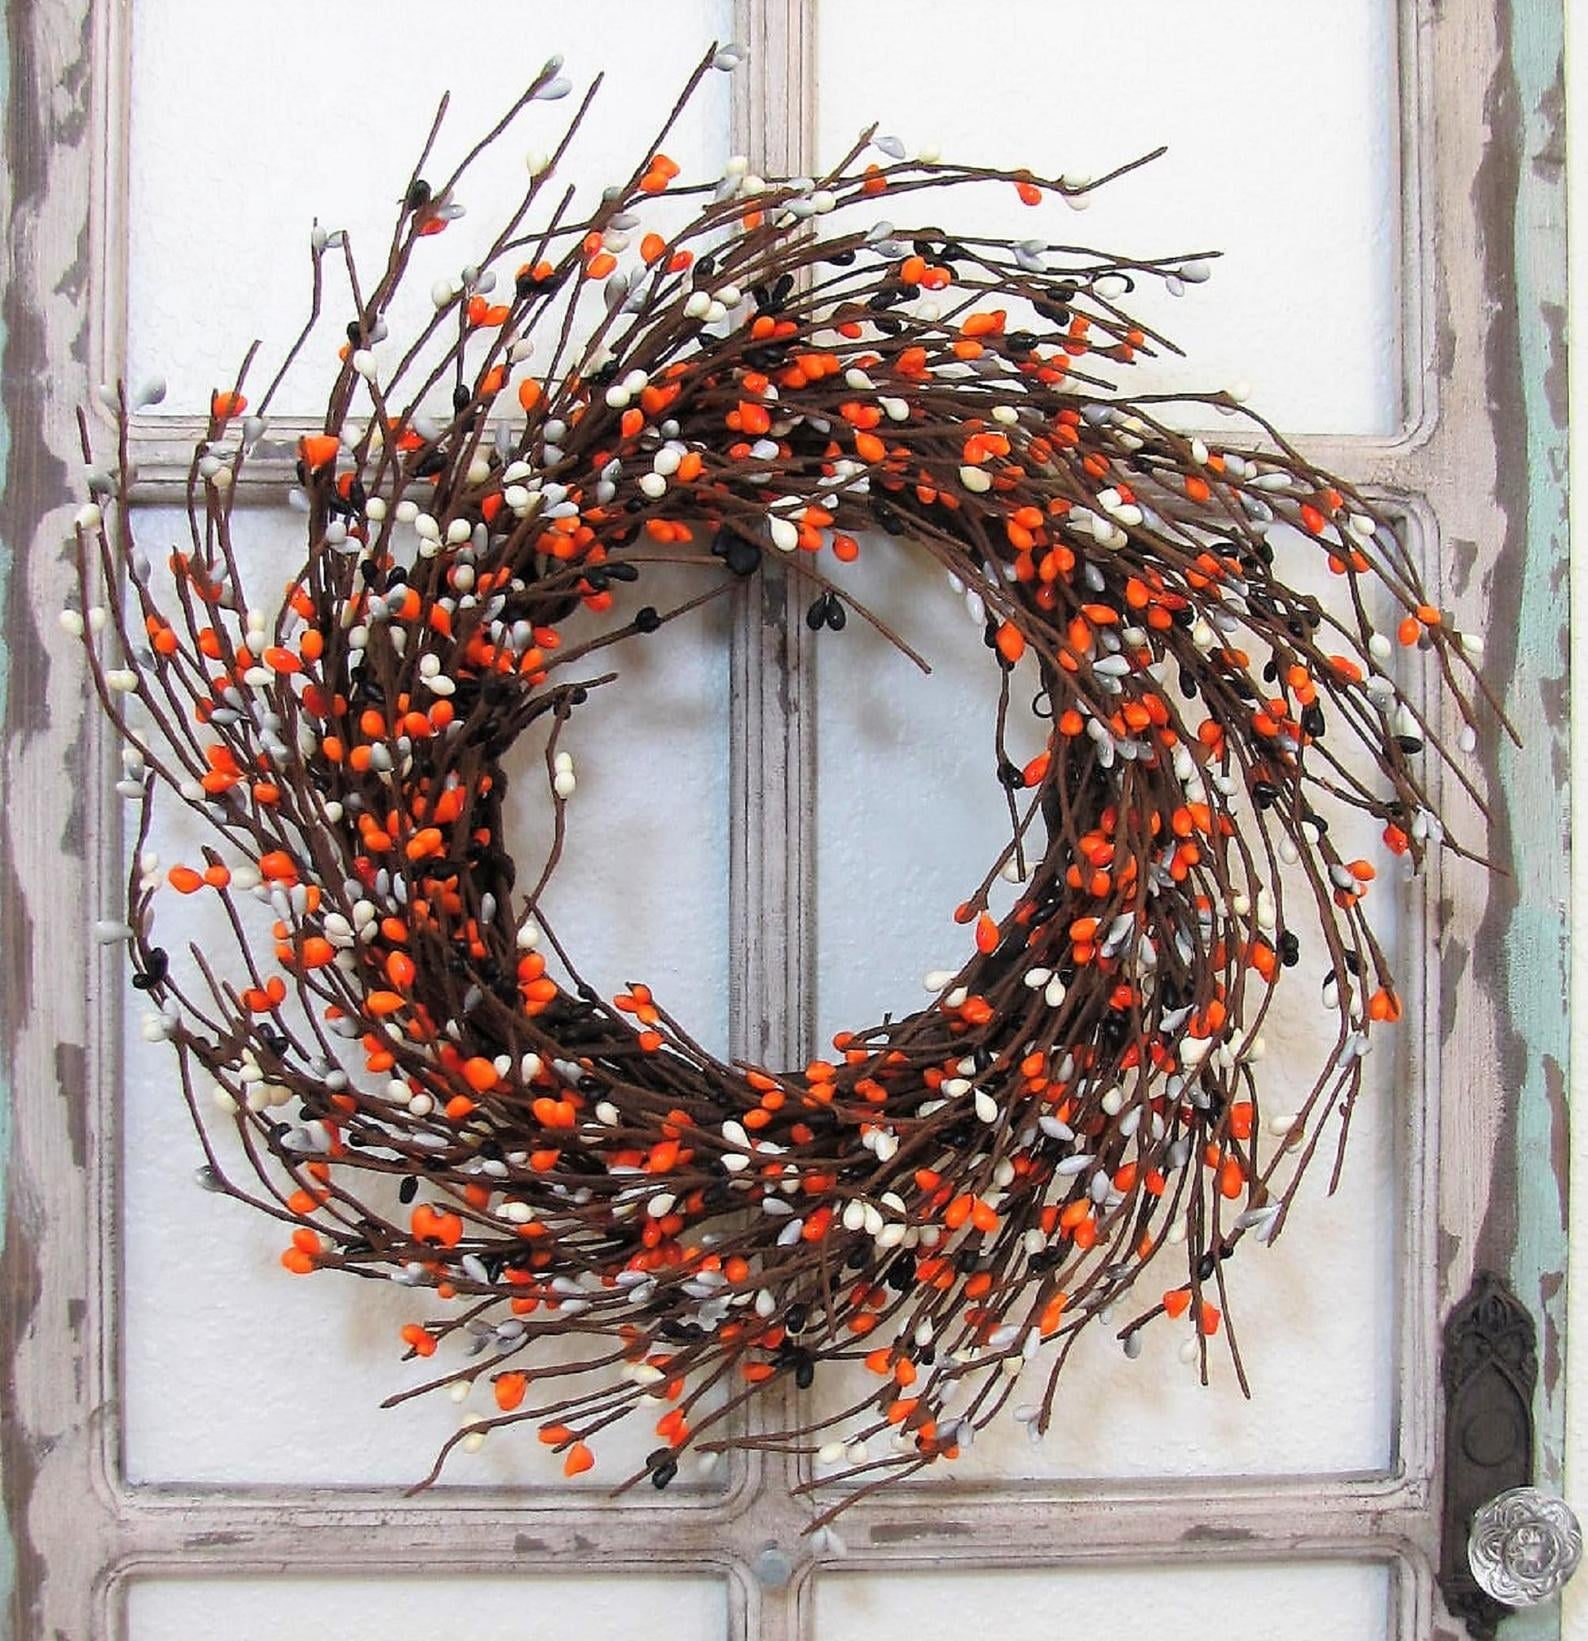 40 Spooky And Festive Halloween Wreaths Popsugar Home